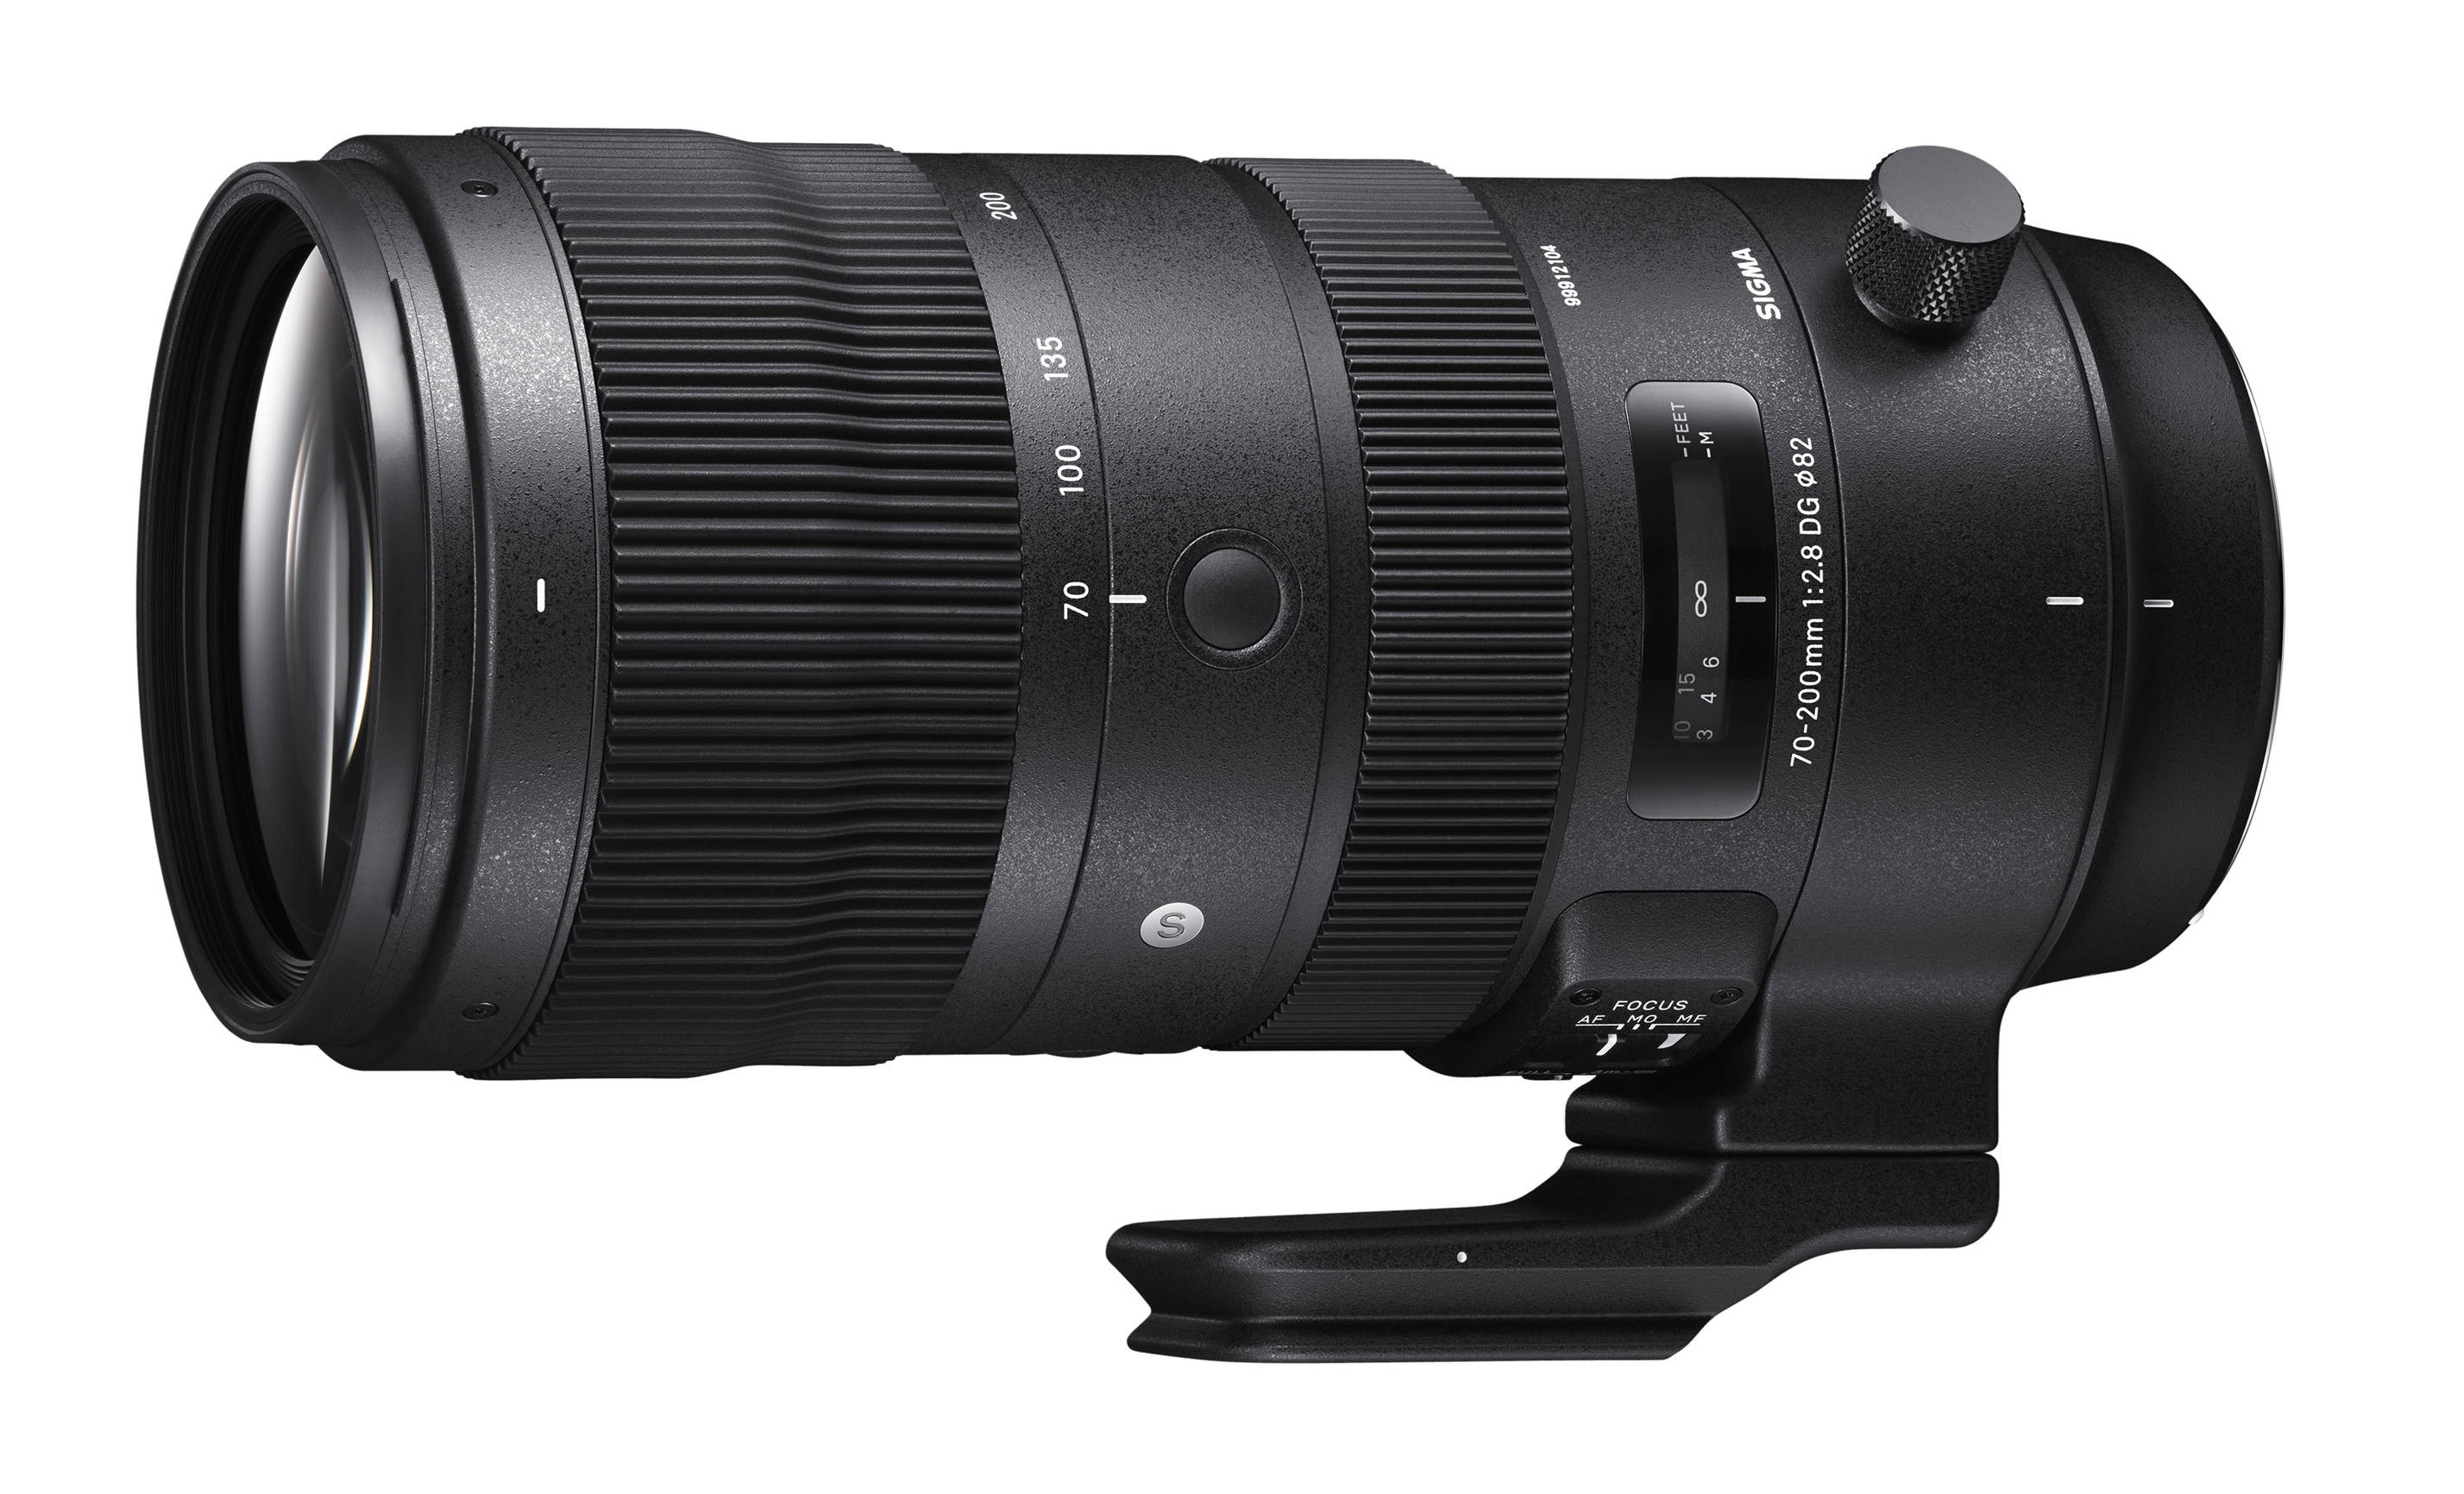 Sigma 70-200mm F2.8 DG OS HSM Lens